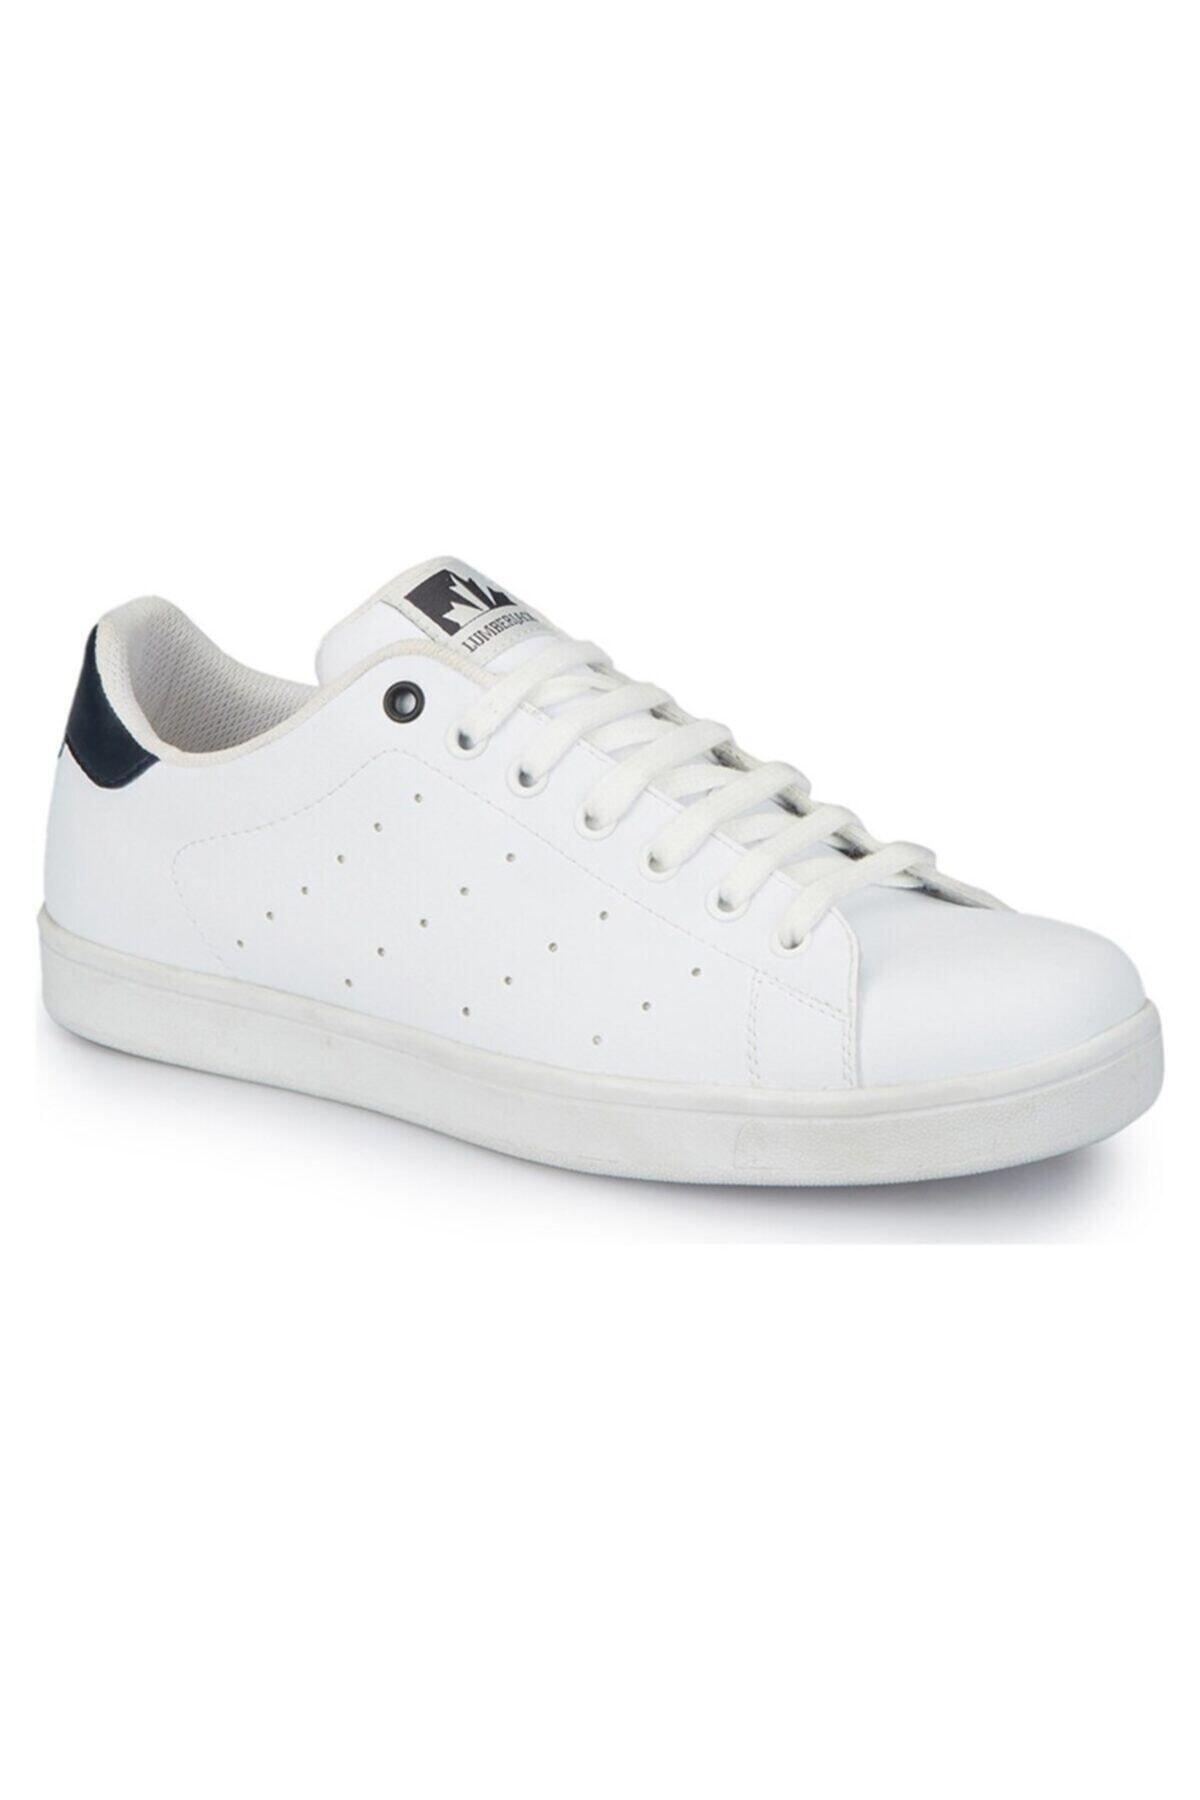 lumberjack GRAZZI 1FX Beyaz Erkek Sneaker Ayakkabı 100785186 1